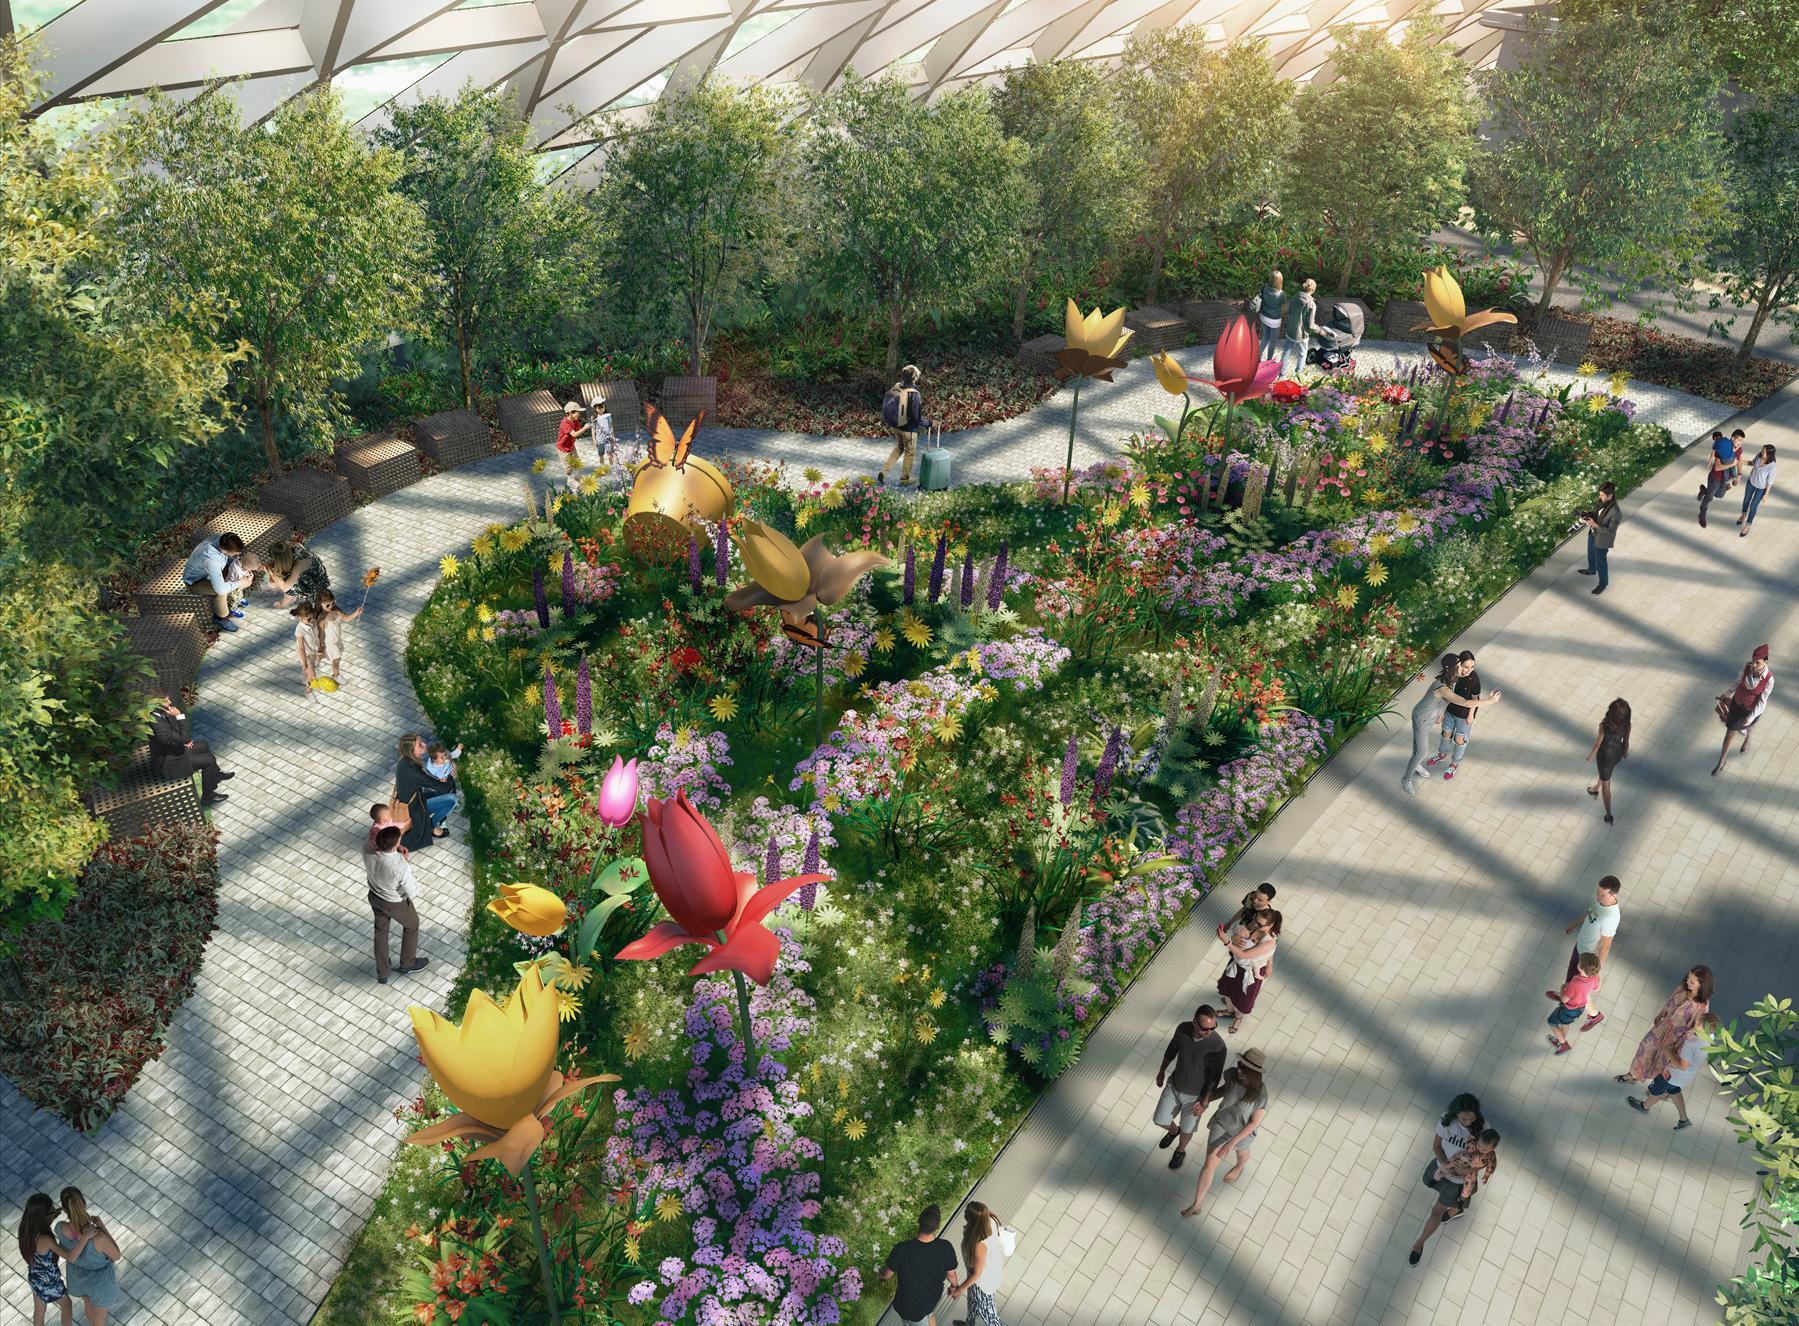 Sky Garden Walk: 5 Attractions To Explore At Jewel Changi Airport